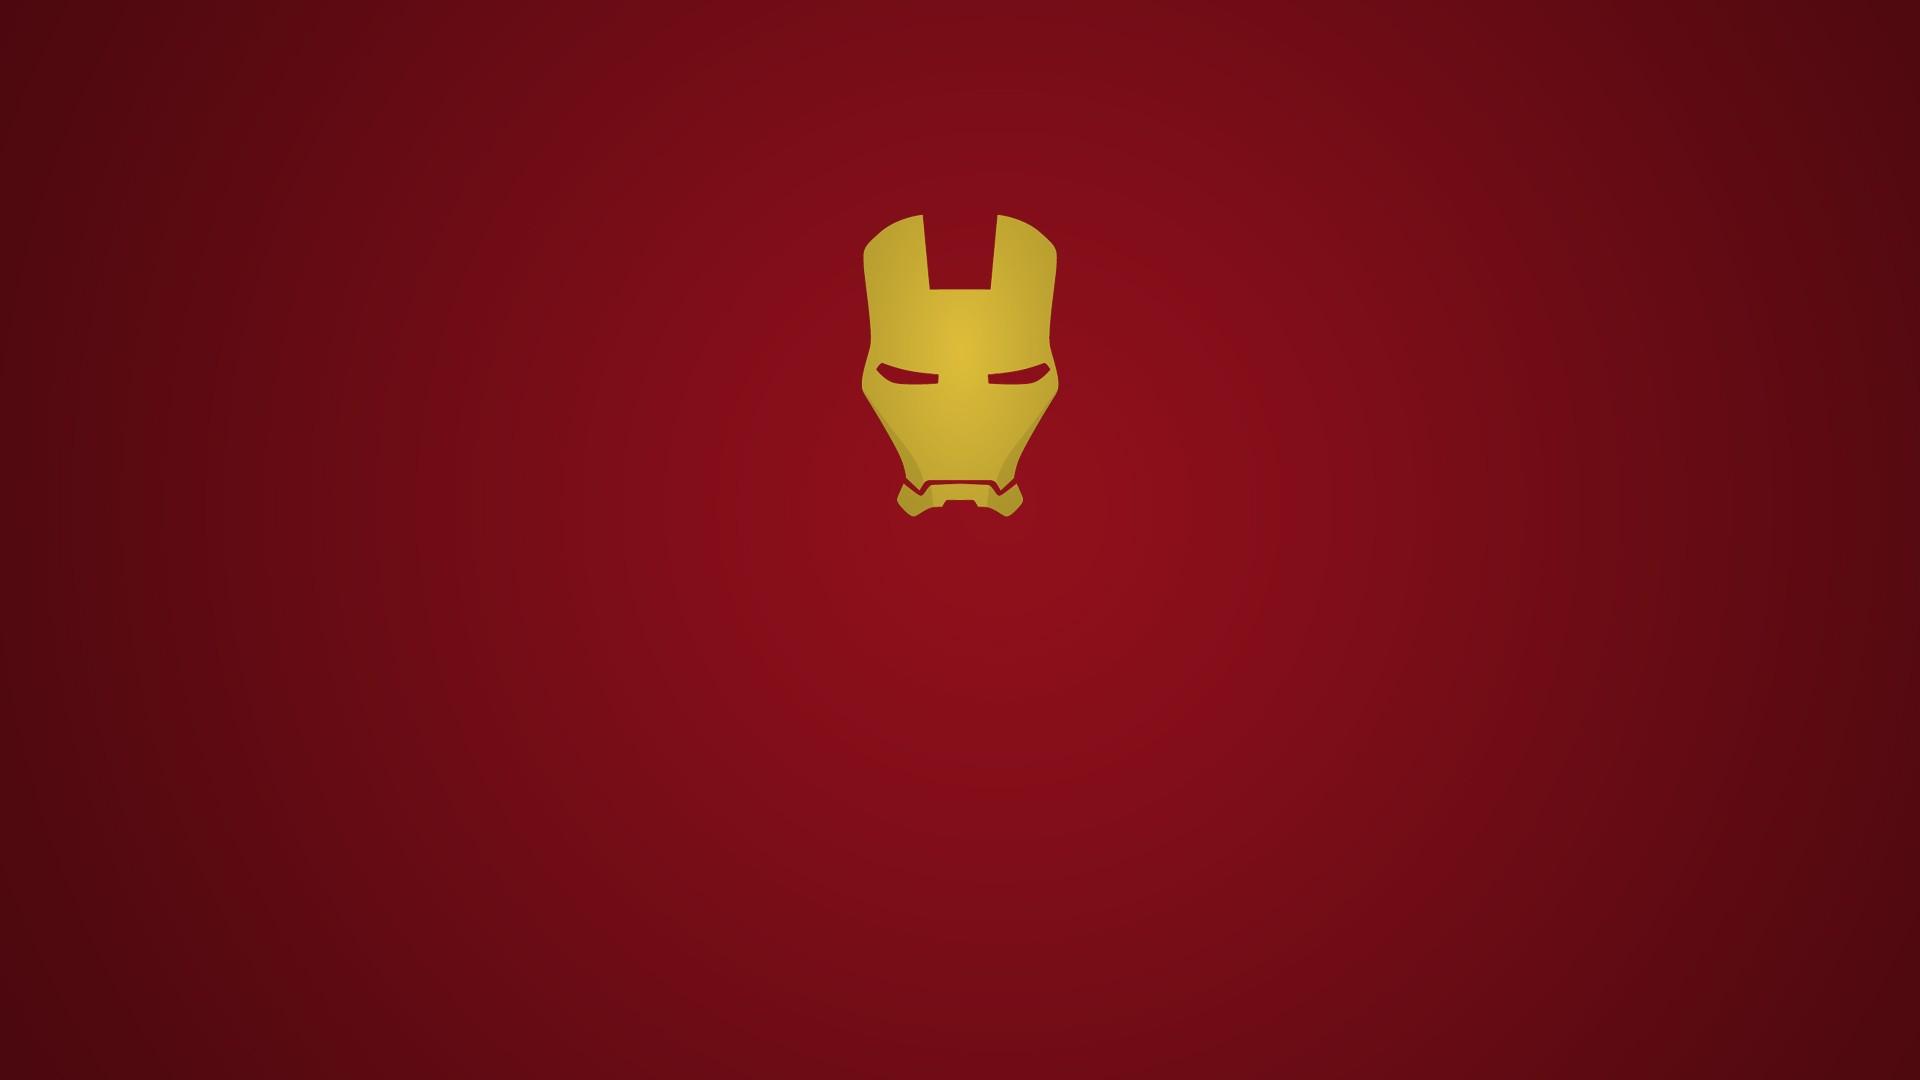 1920x1080 Iron Man Simple 2 Laptop Full Hd 1080p Hd 4k Wallpapers